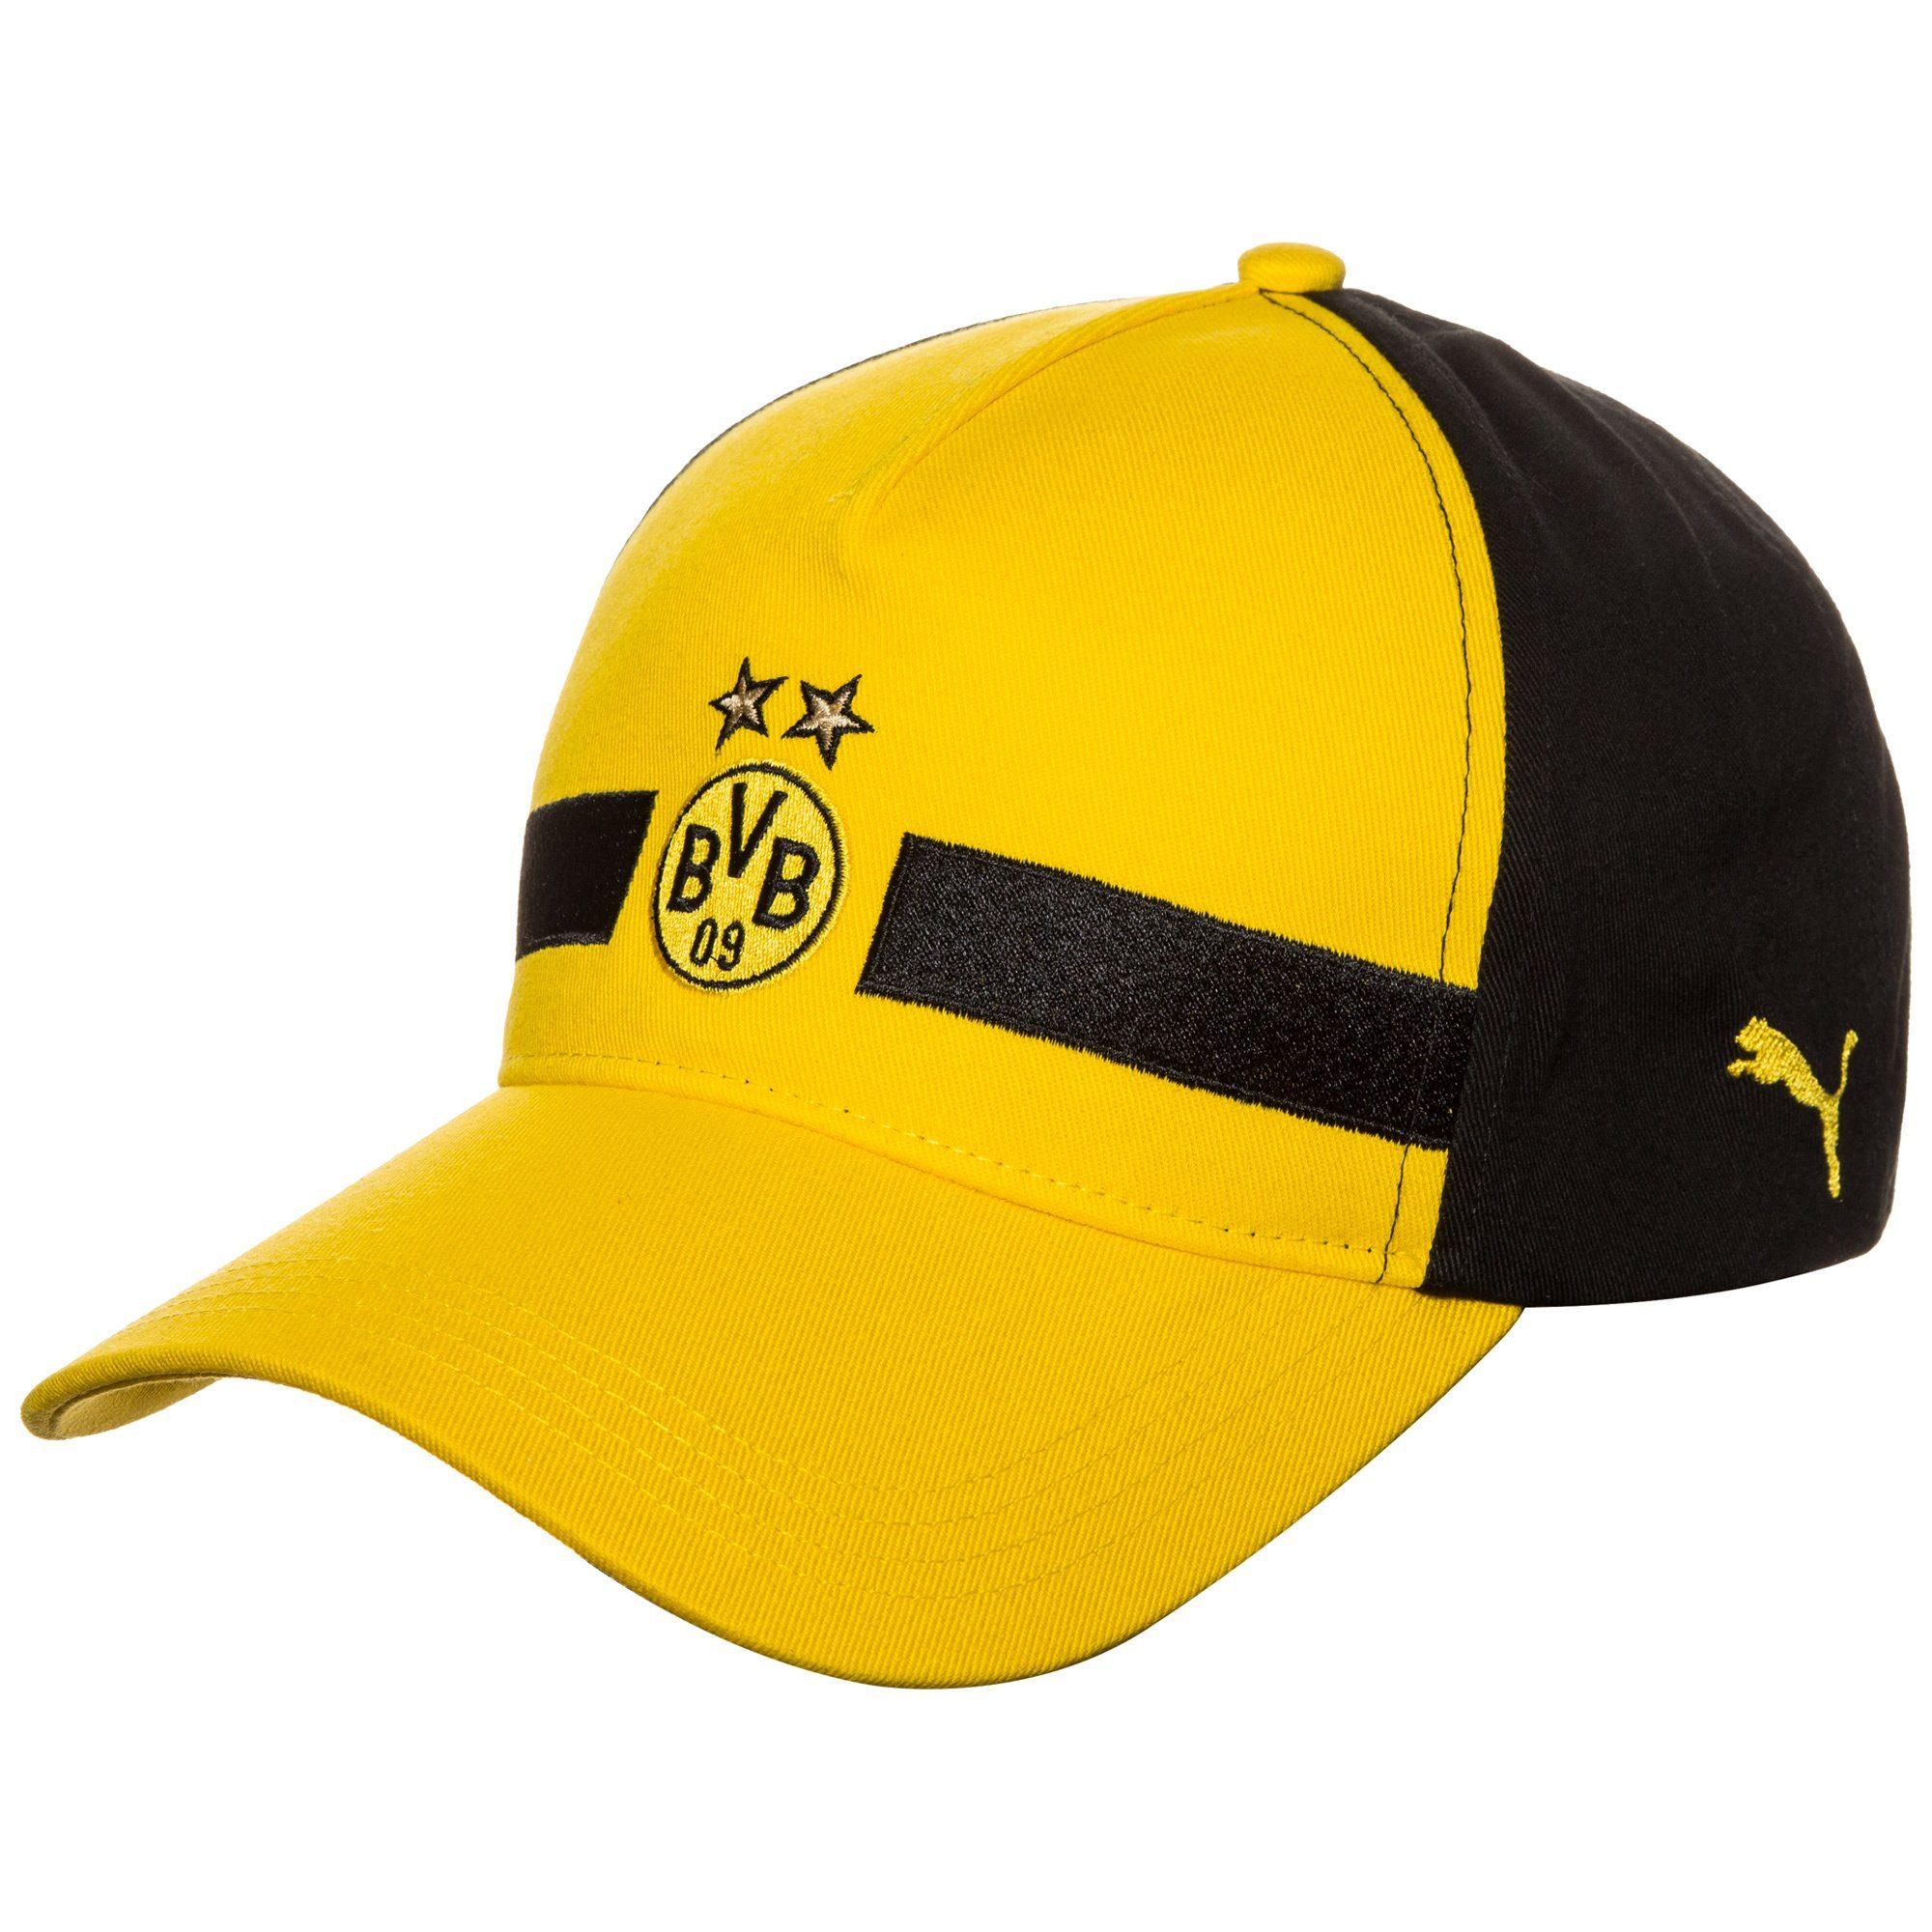 PUMA Borussia Dortmund Snapback Cap